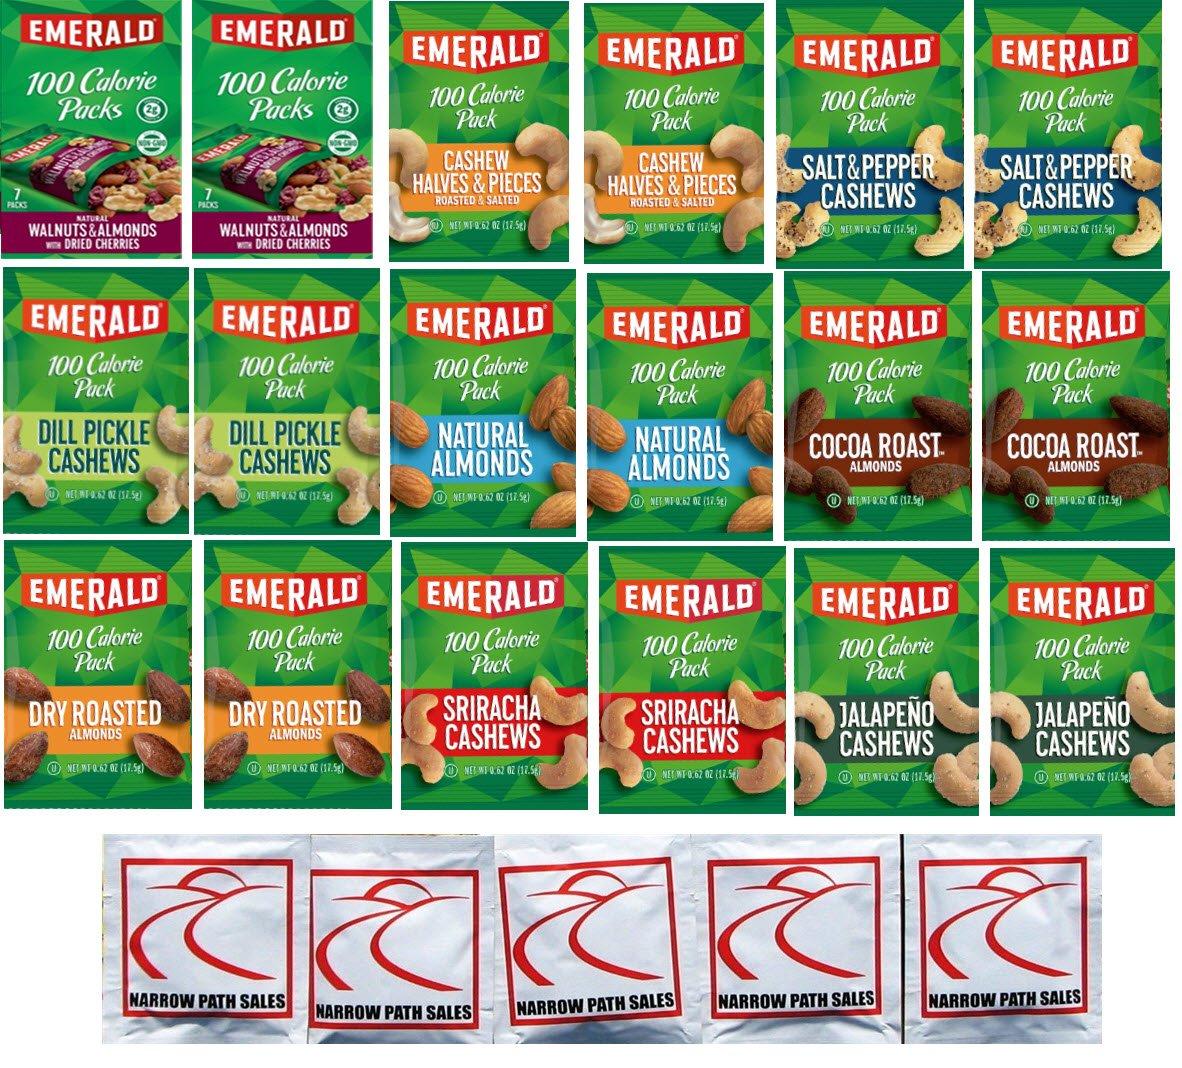 Emerald Nuts 100 Calorie Packs Variety Sampler Pack of 18 bags, 9 Flavors